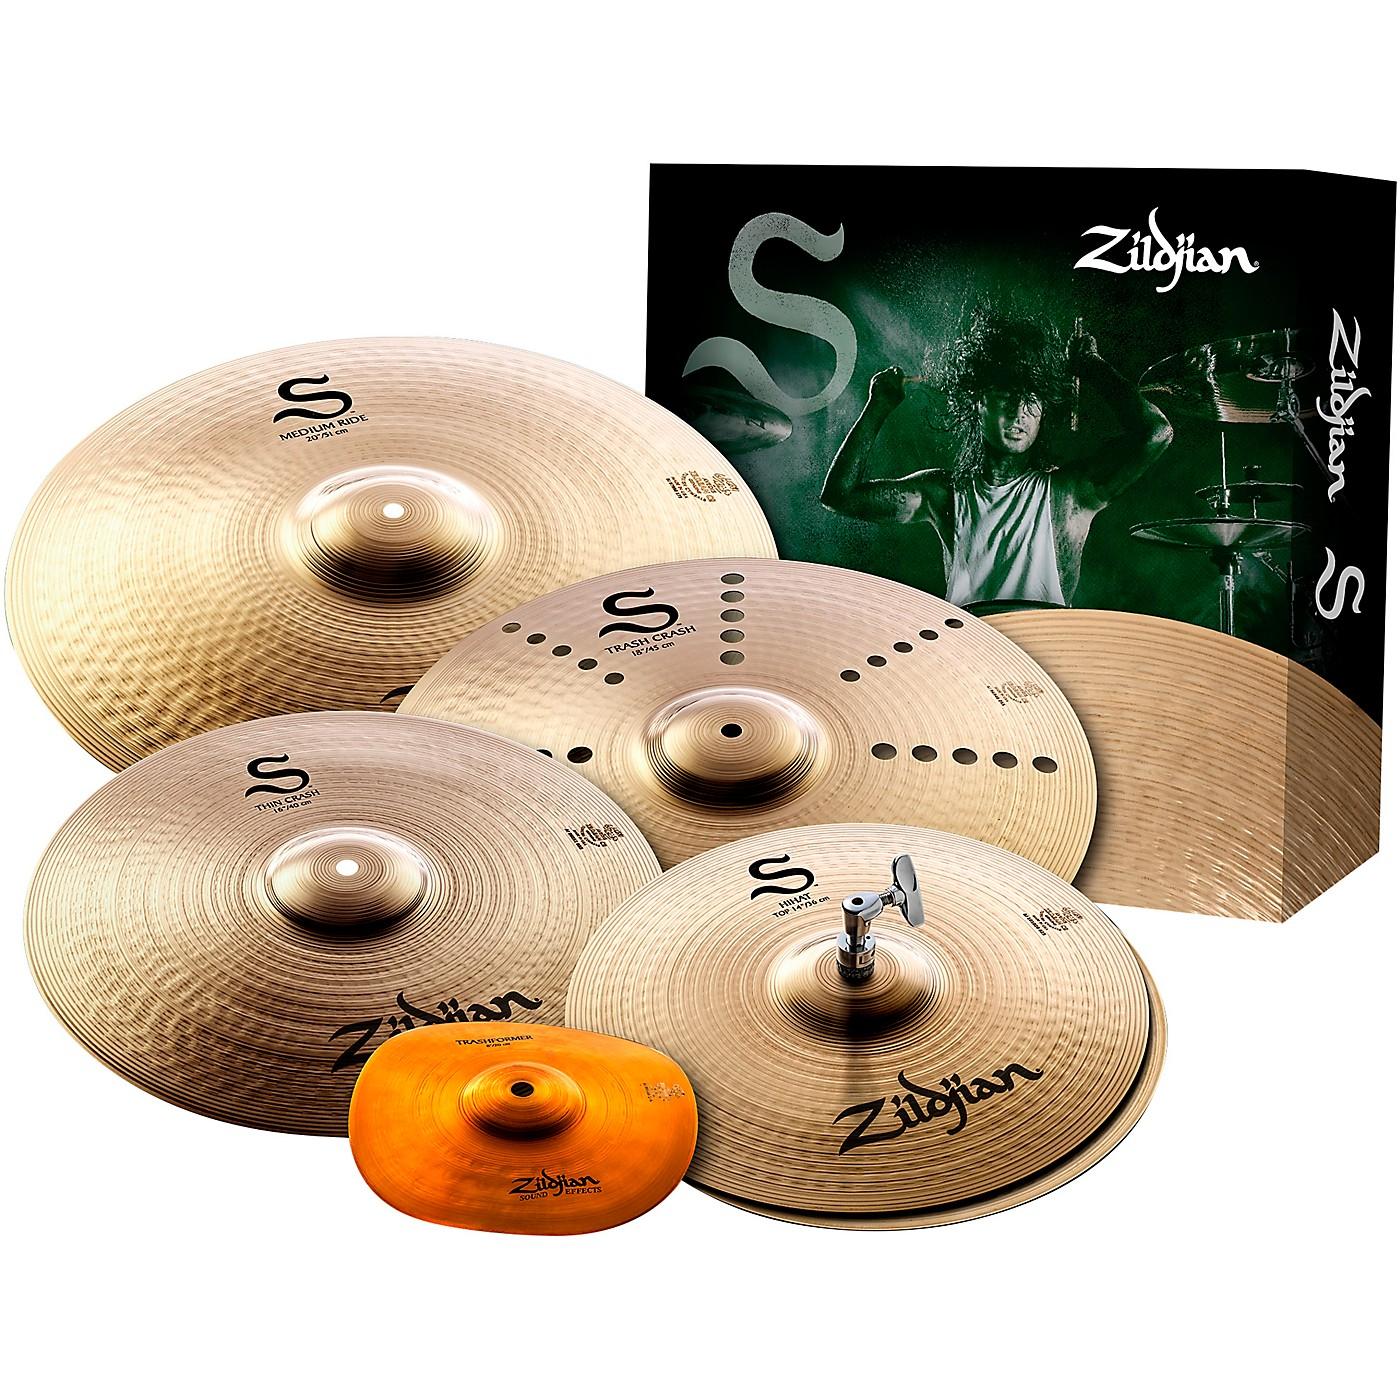 Zildjian S Series FX Cymbal Pack thumbnail